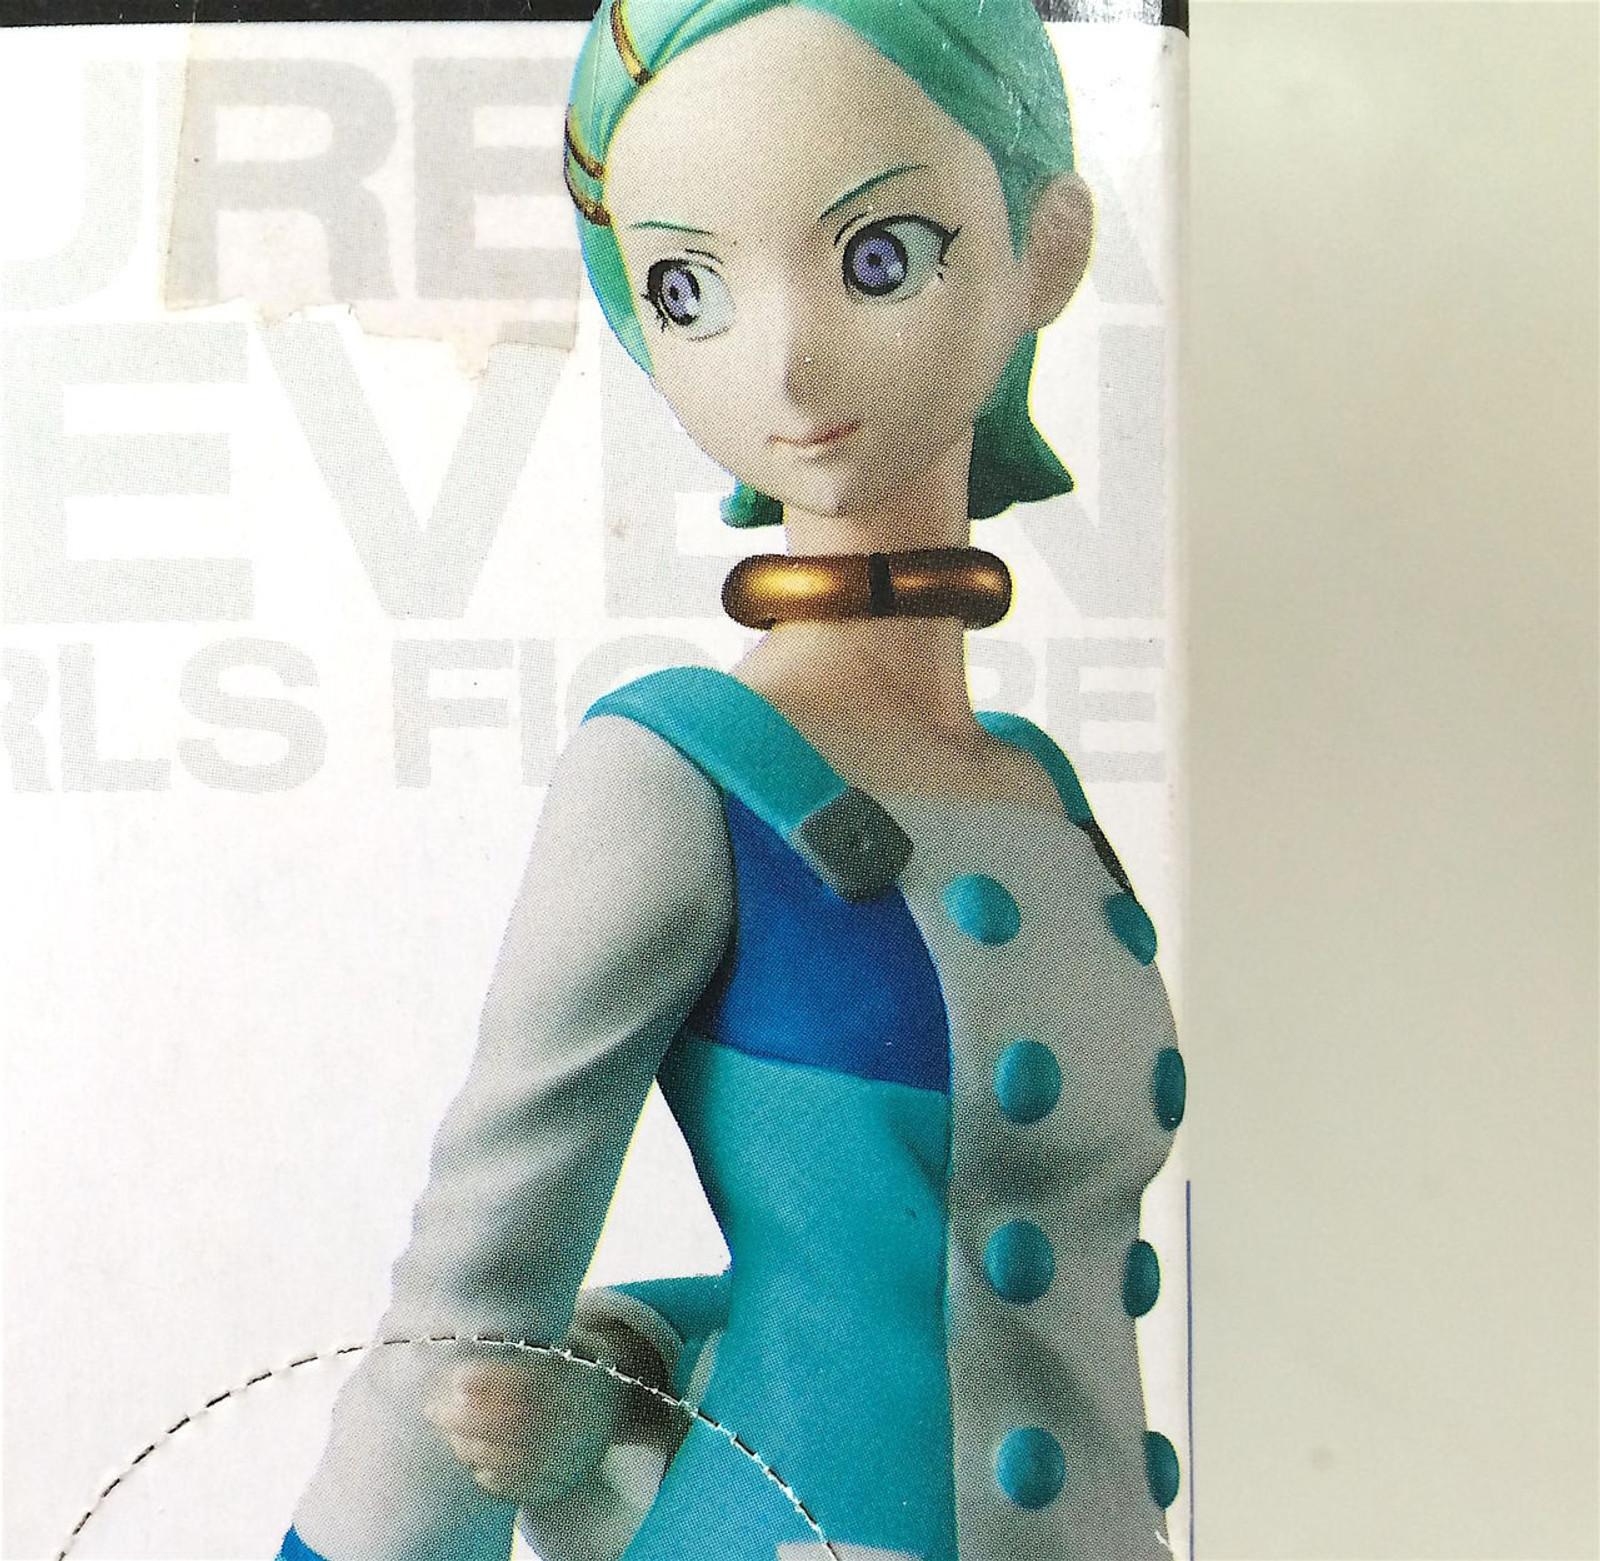 Eureka Seven Psalms of Planets EUREKA DX Girls Figure JAPAN ANIME MANGA 2